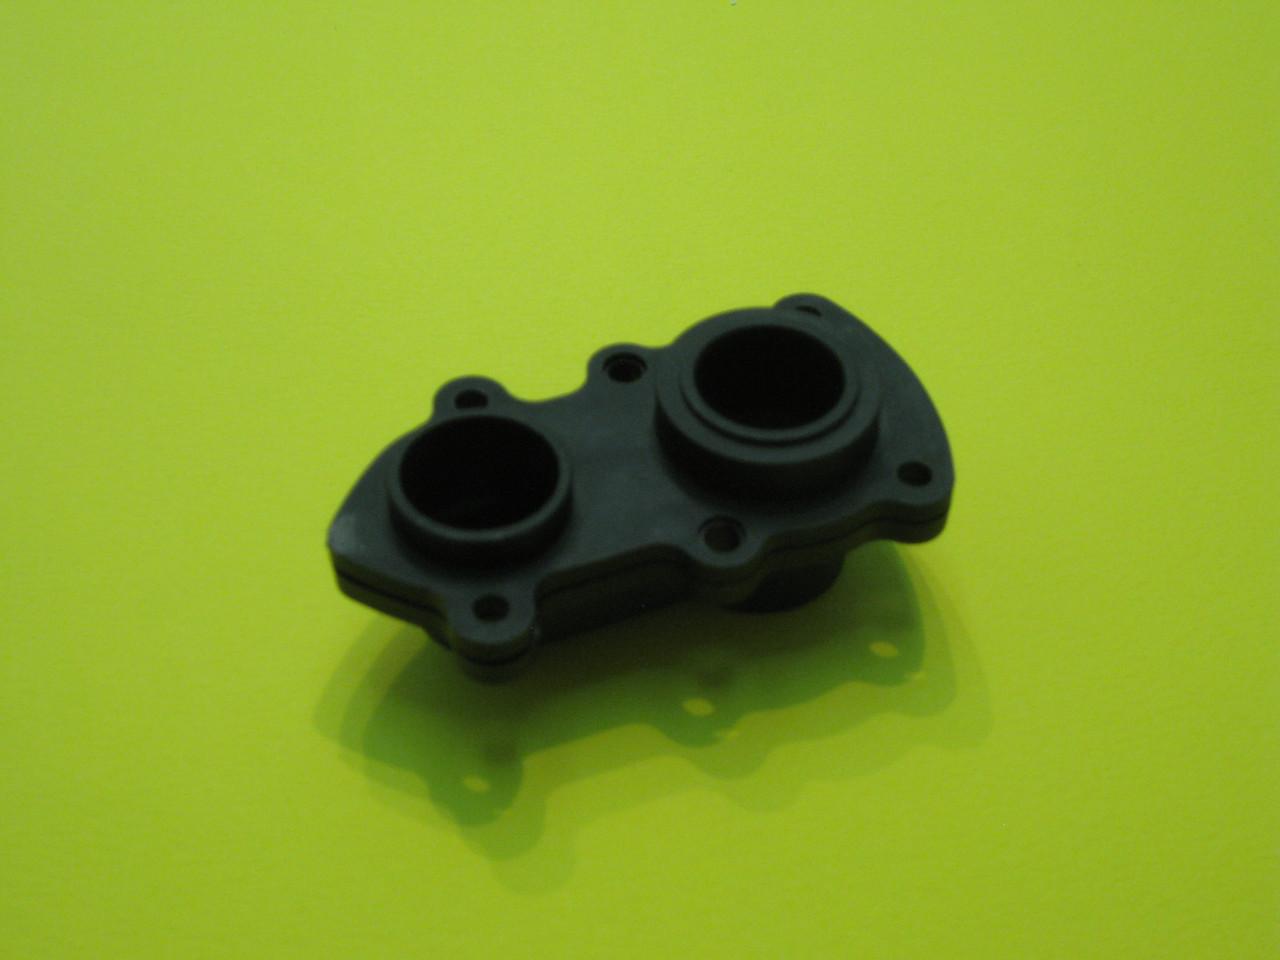 Задняя пластмассовая часть гидроблока 3003201631 (D003201631) Demrad Kalisto Mono HK (BK) - B -124 / 130 D